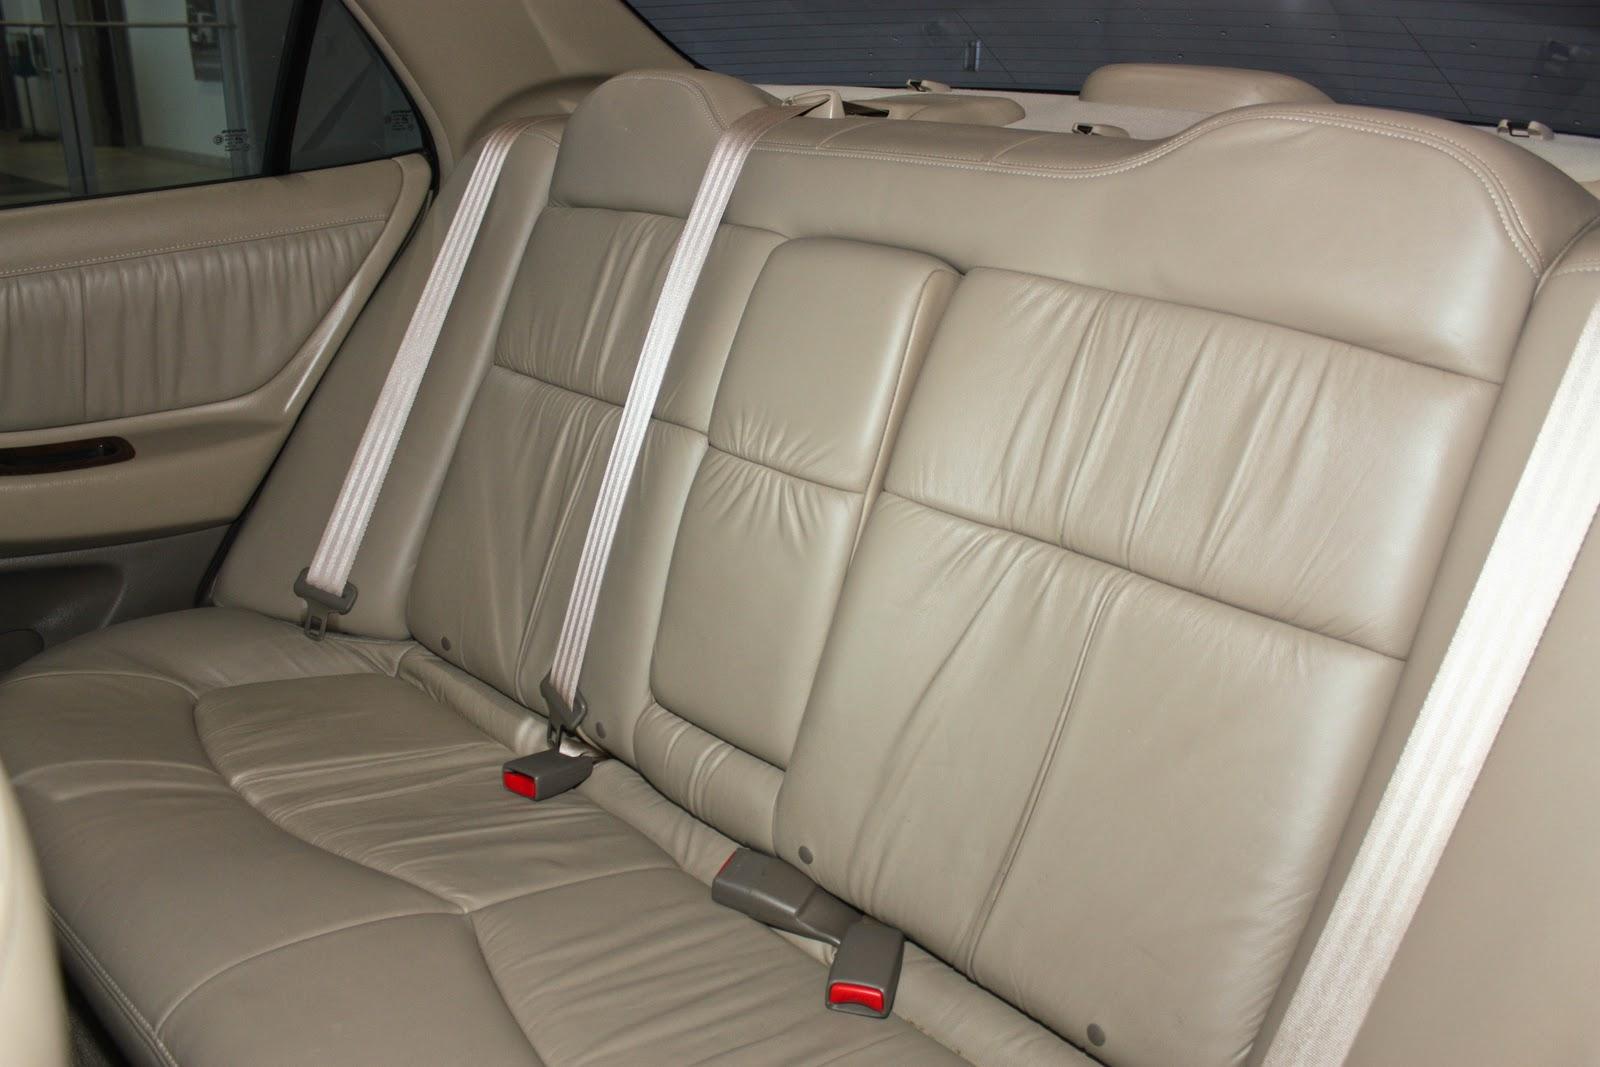 2001 Honda Accord Ex V6 For Sale Used Cars Fort Wayne